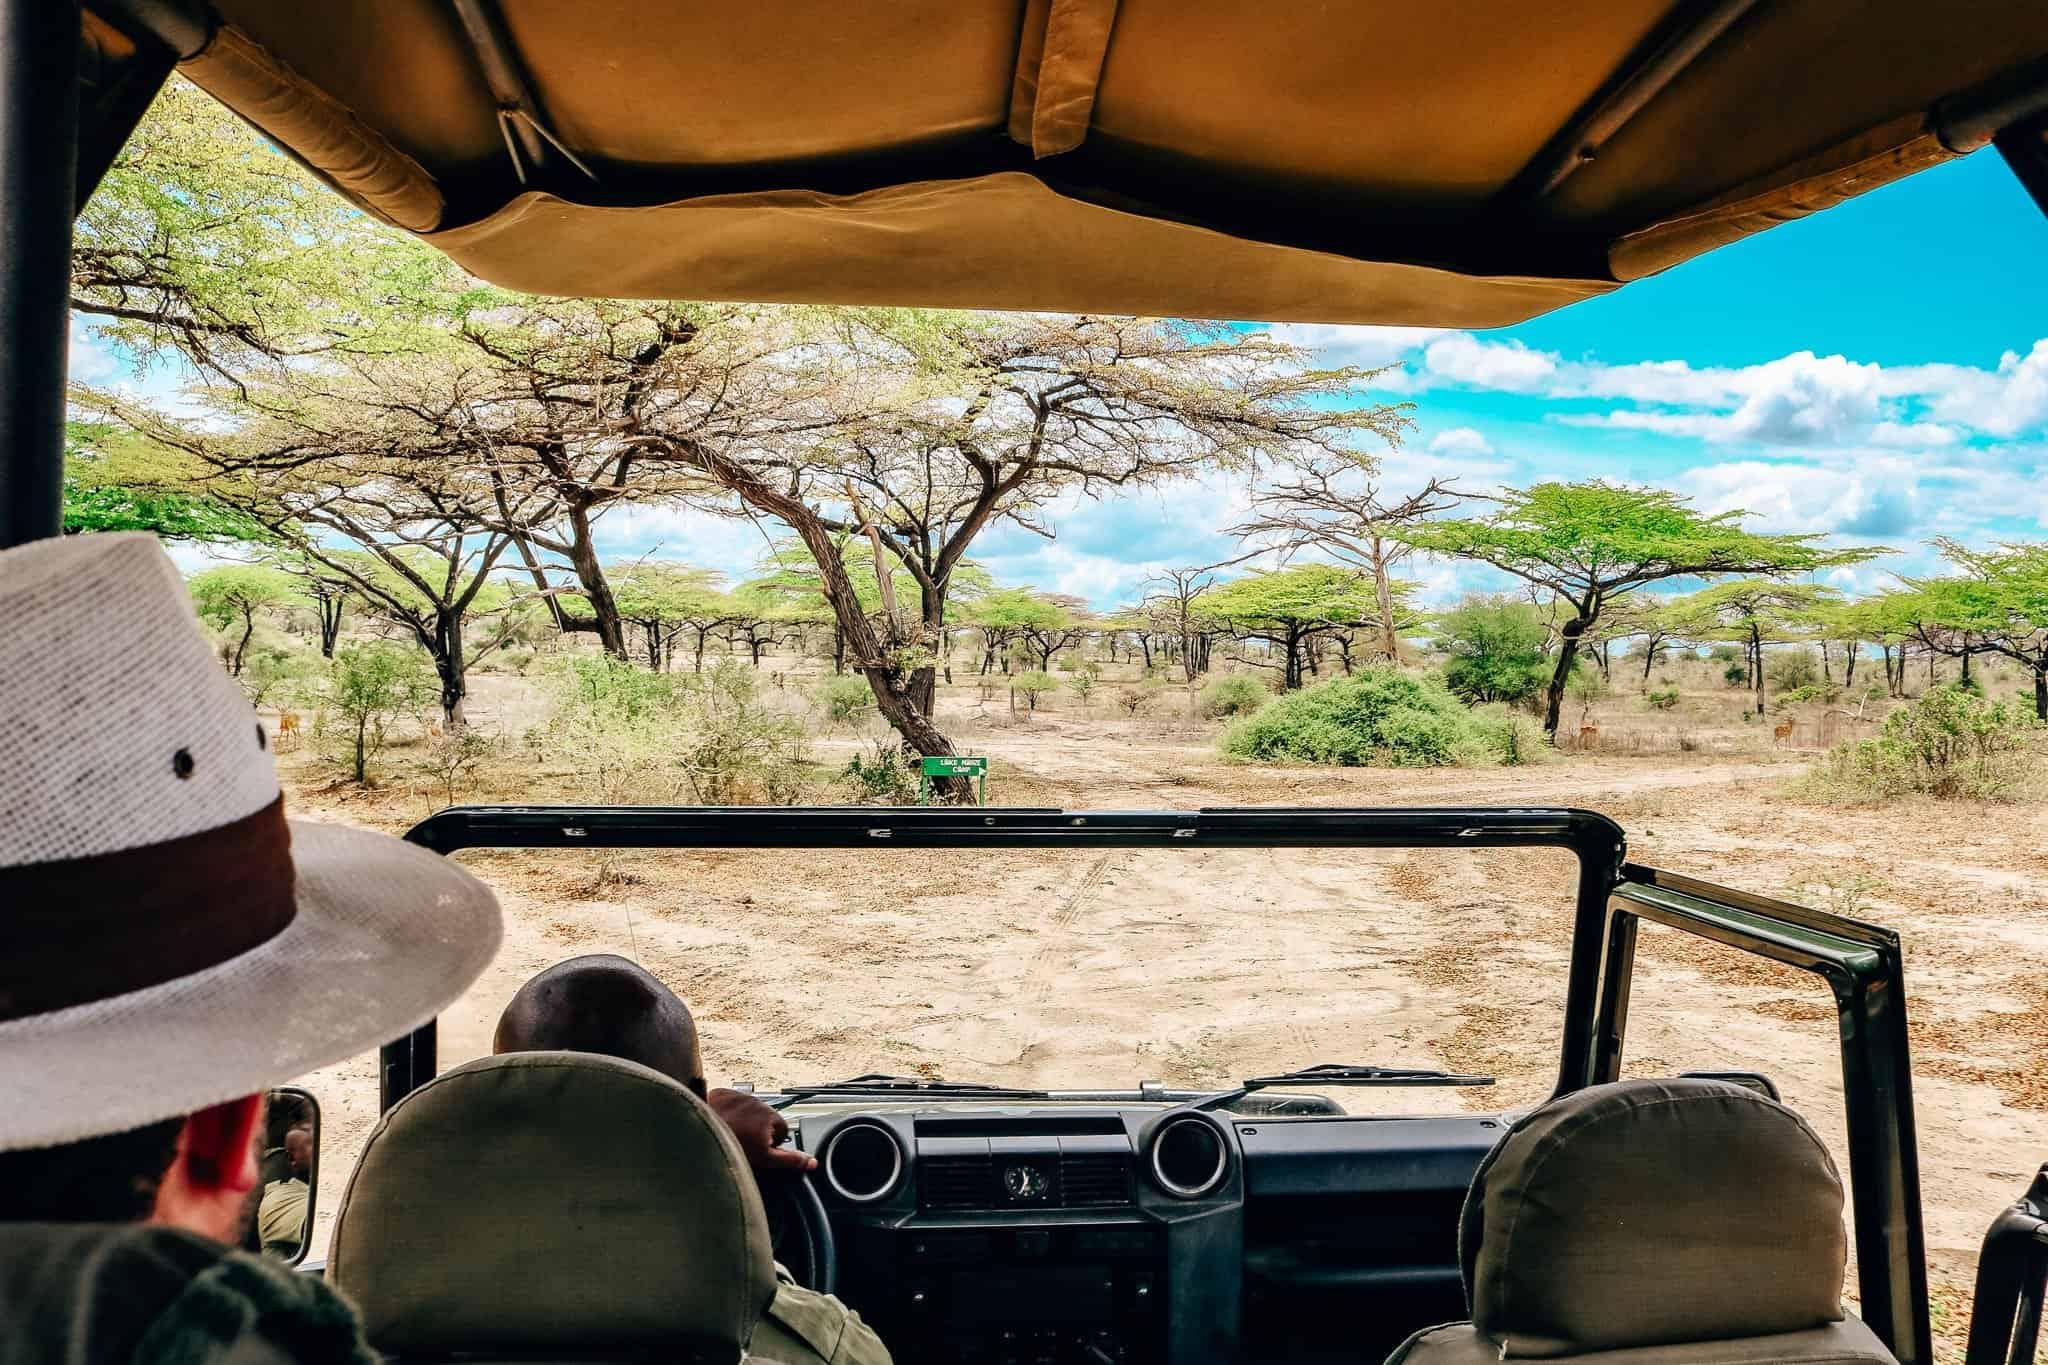 View from the Safari Car - African Safari Drive in the Selous Game Reserve